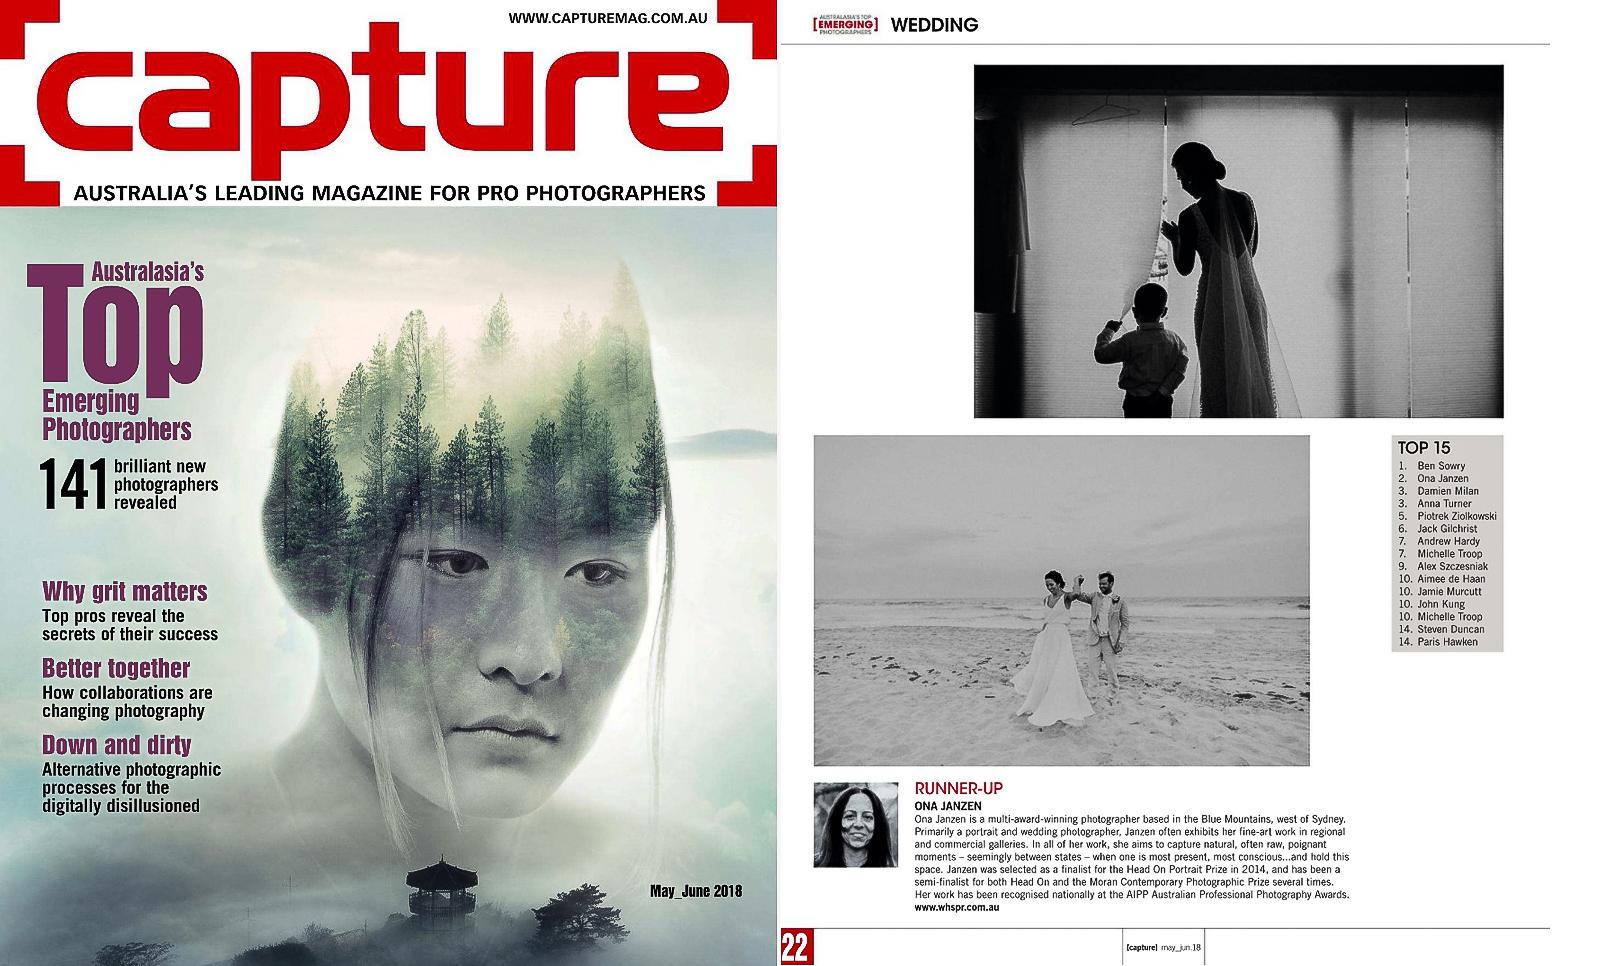 Australasia's Top Emerging Wedding Photographers 2018